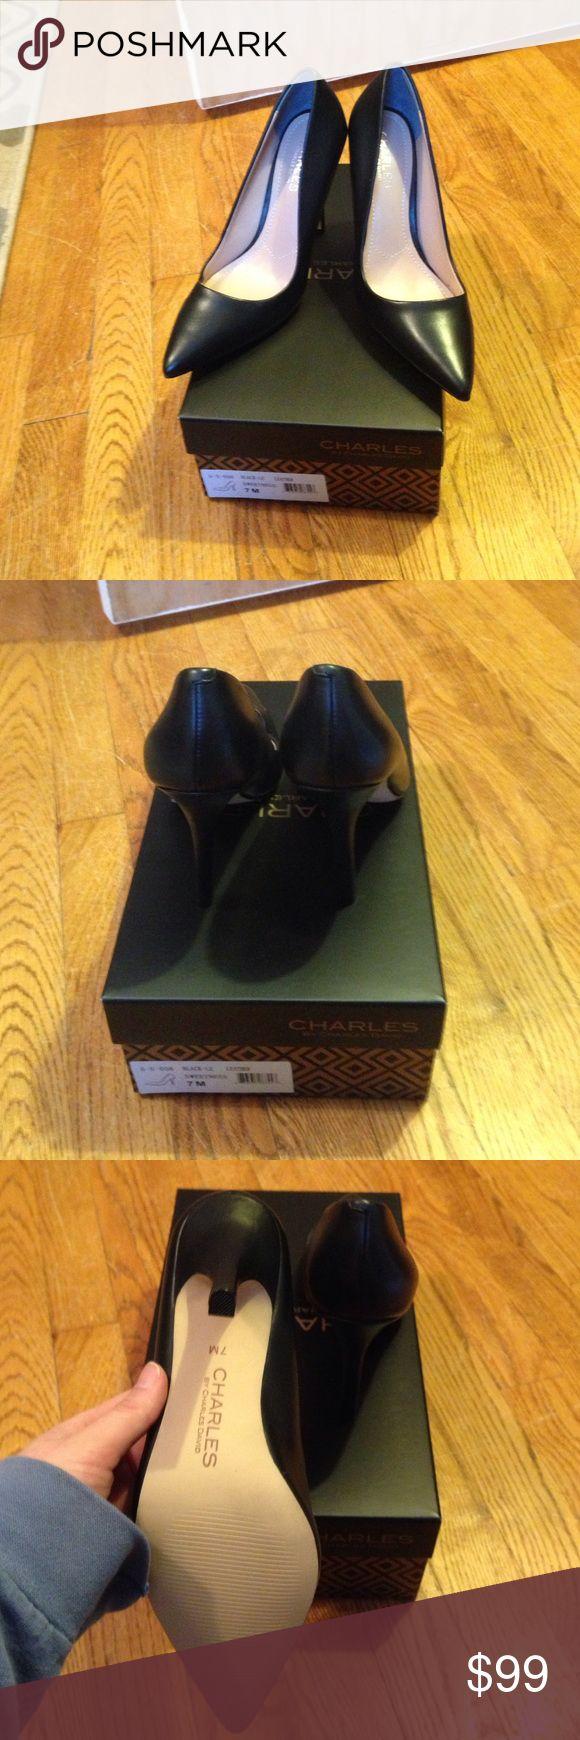 Brand New Charles David black heels size 7 Brand New in box black high heels Charles David heels size 7 Charles David Shoes Heels